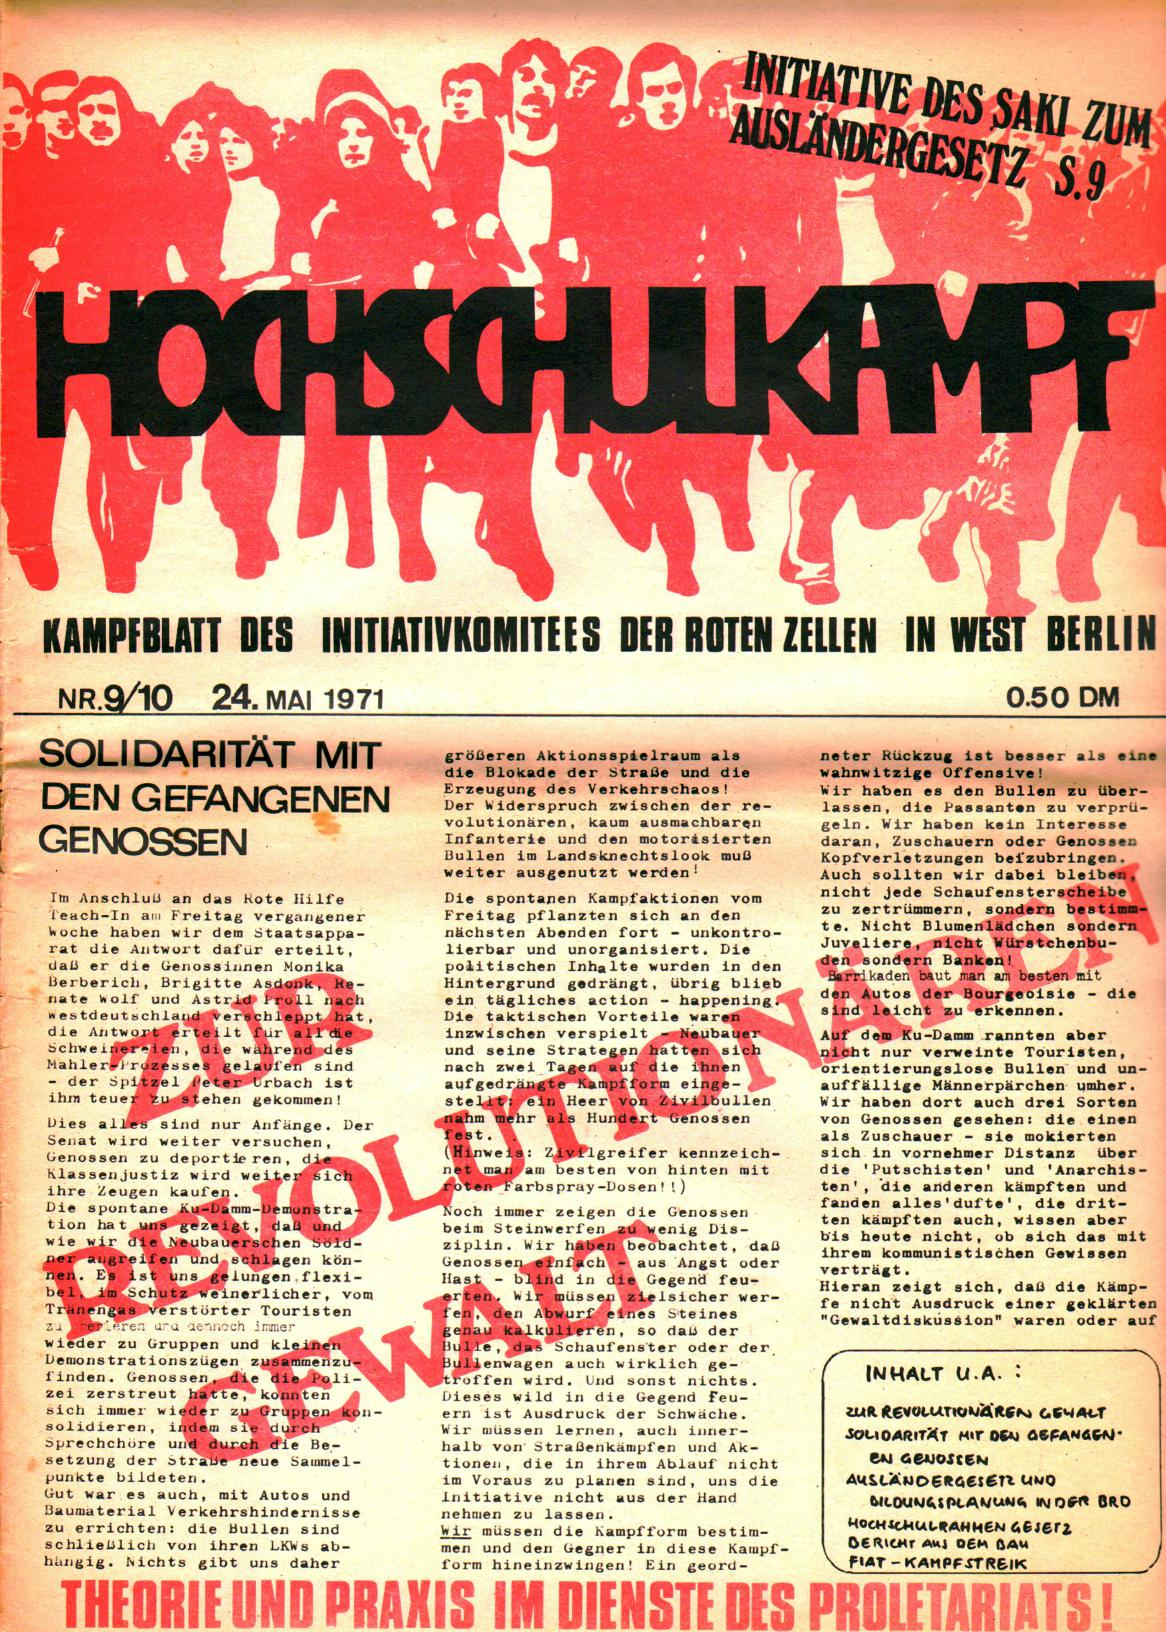 Berlin_Hochschulkampf_1971_09_01